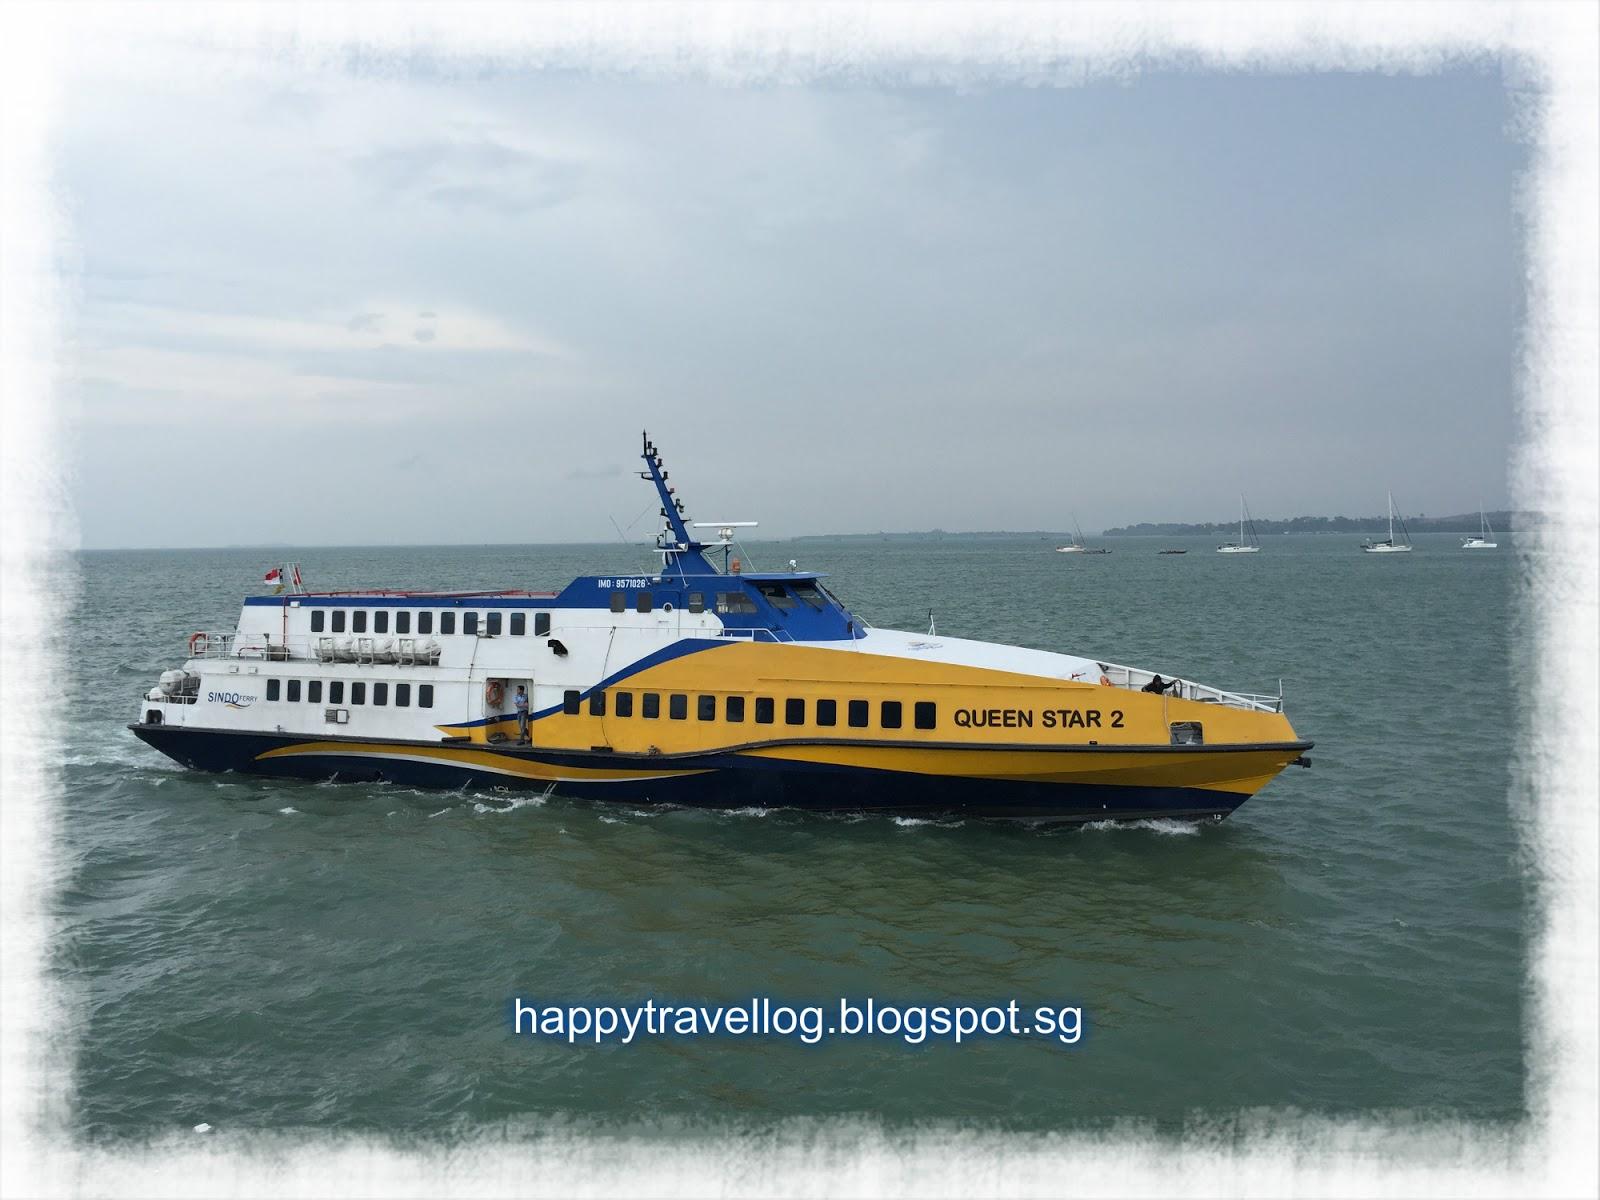 happy travel log tanjung pinang